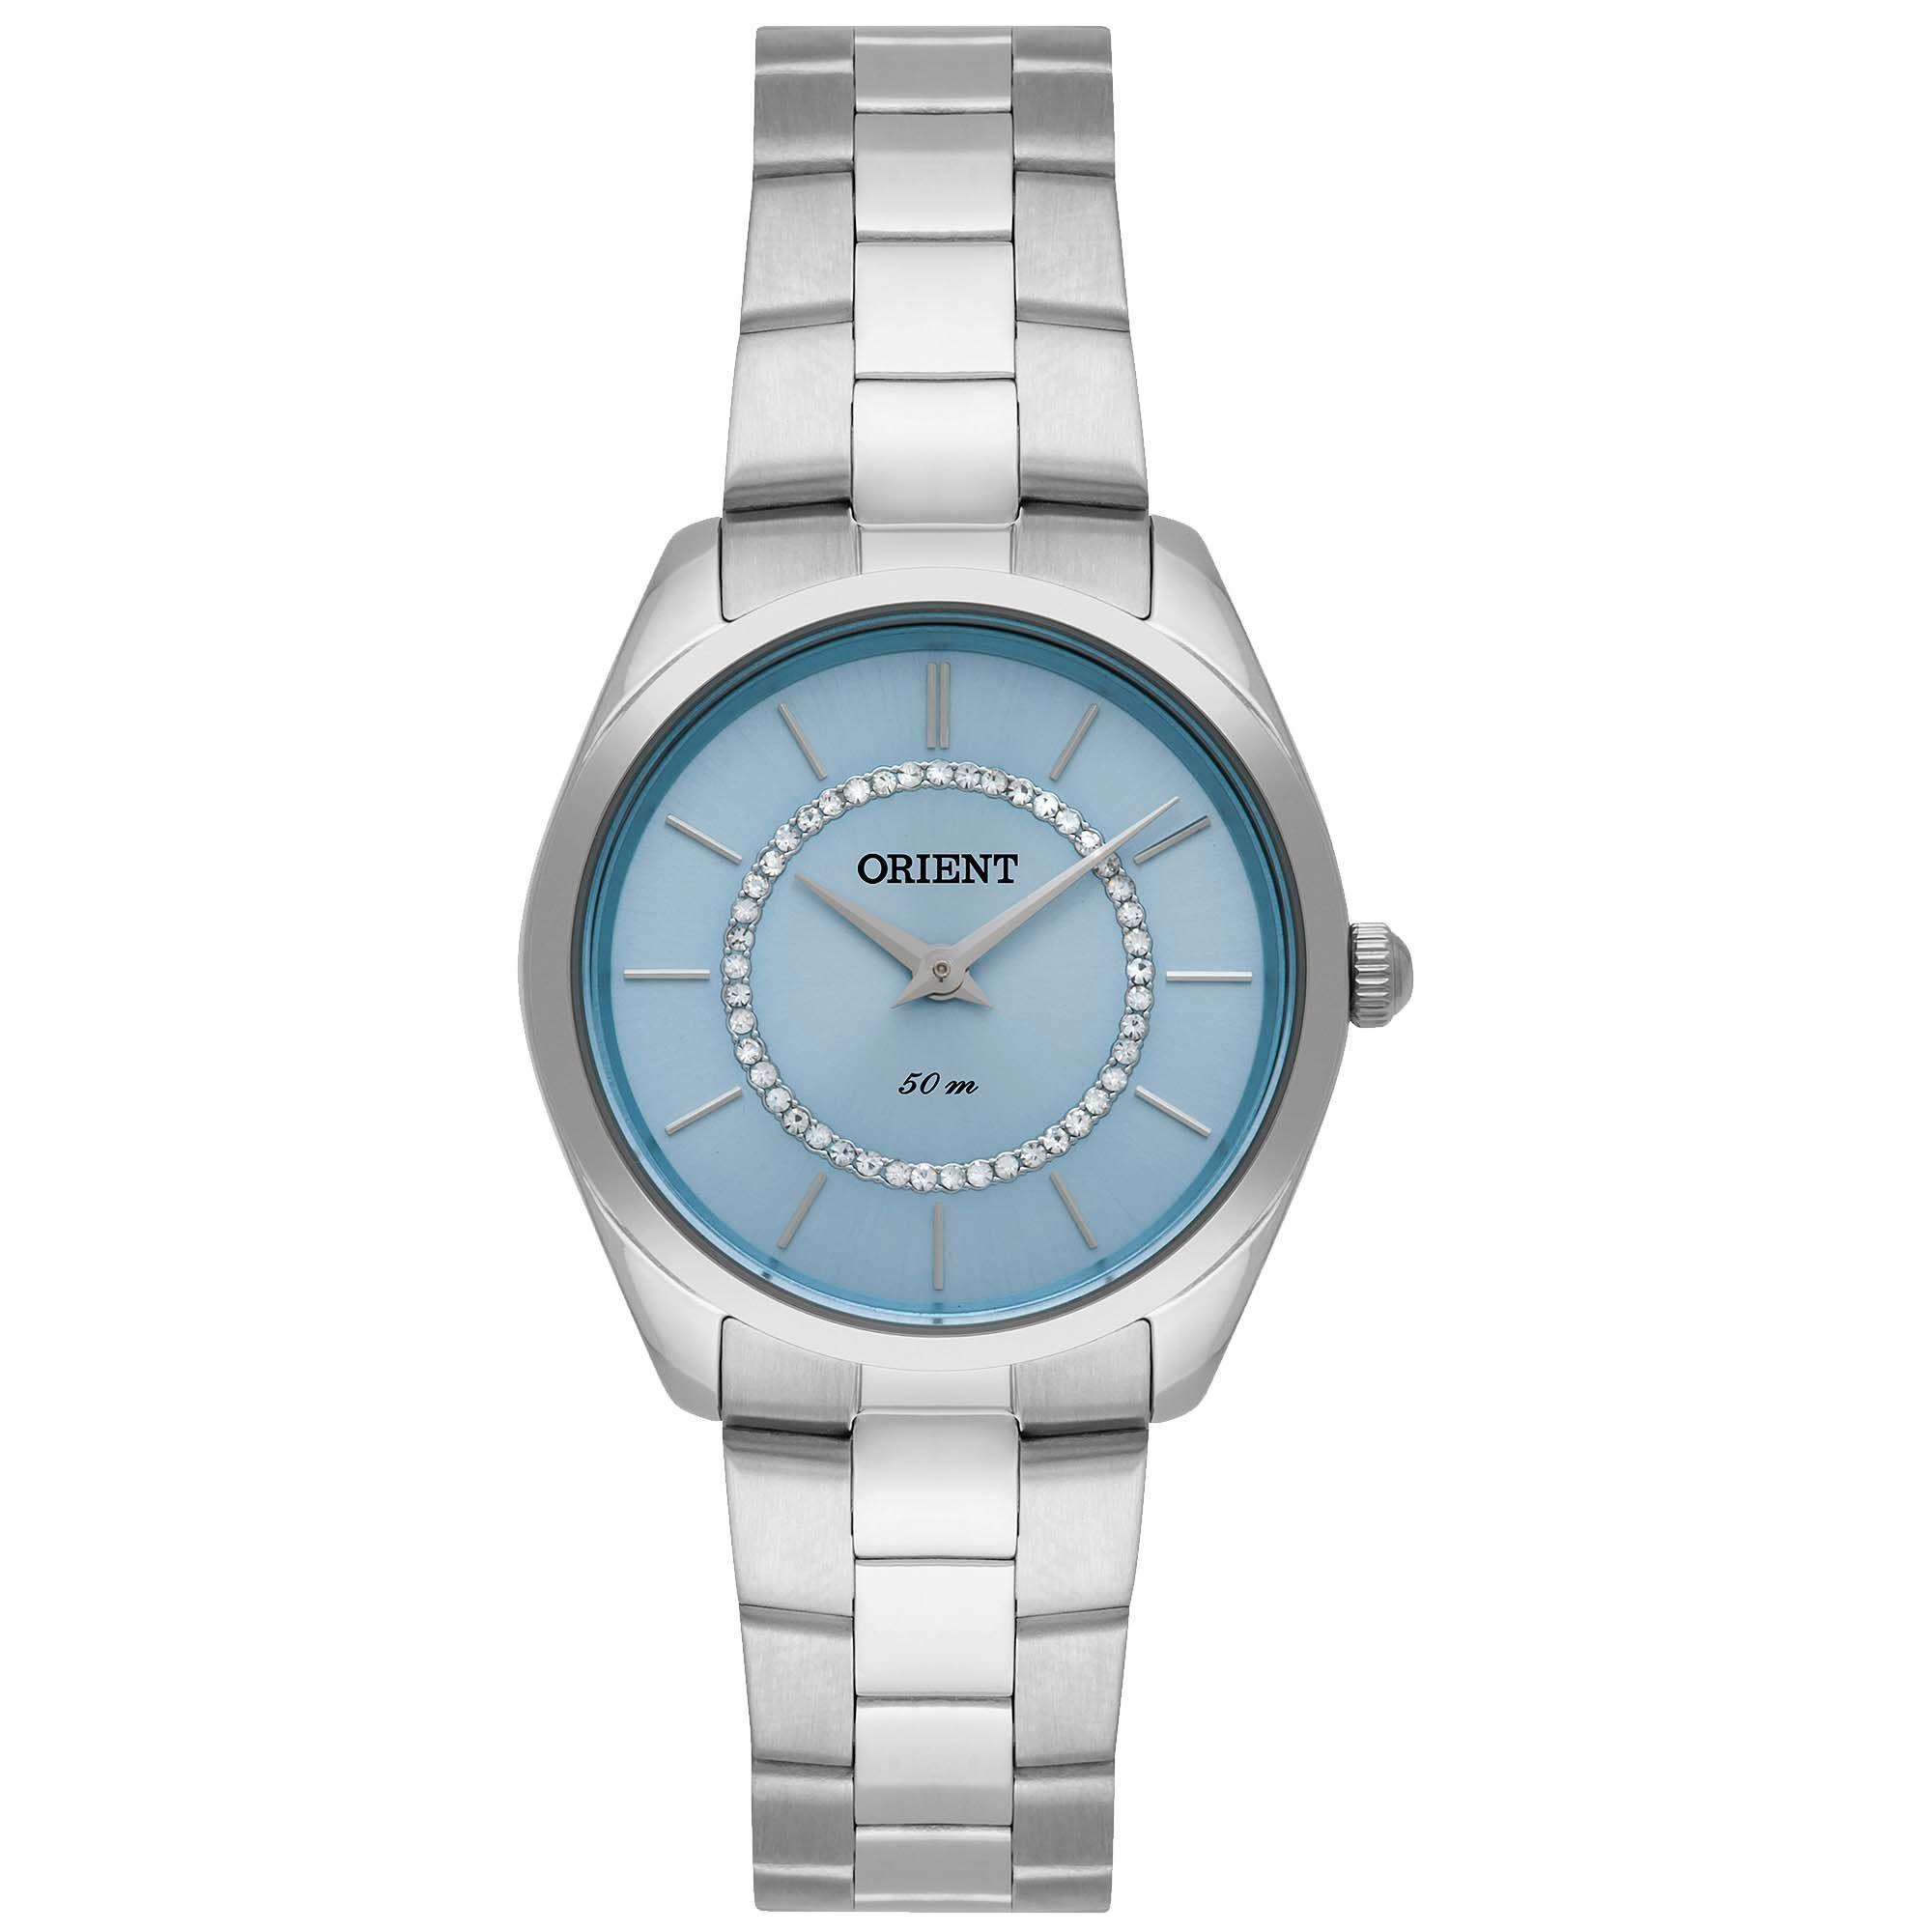 Relógio Feminino Orient FBSS0080 A1SX